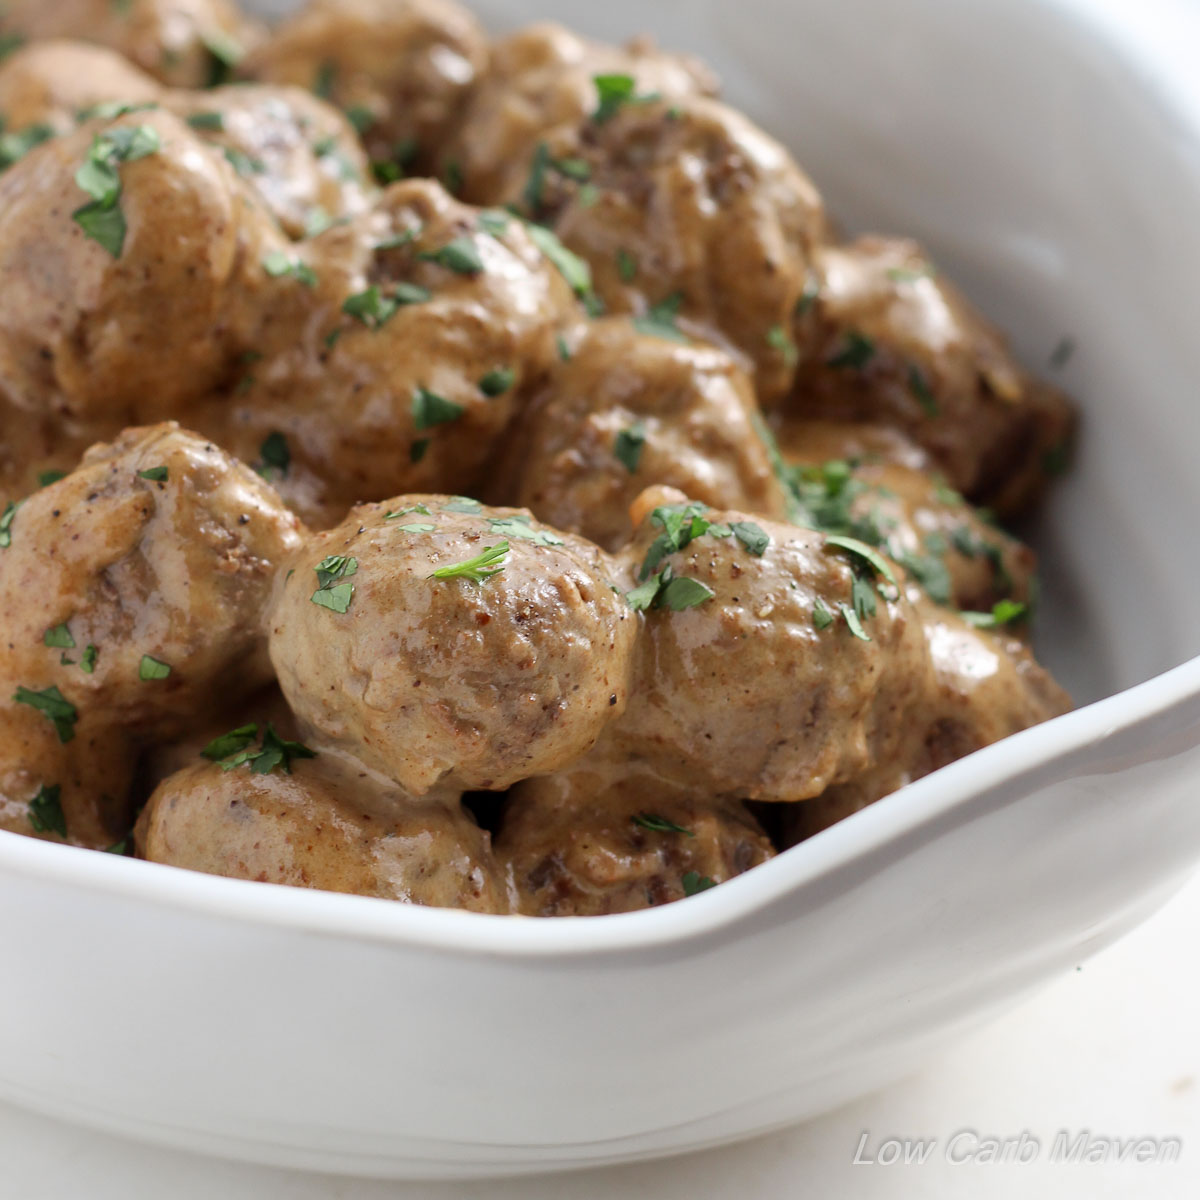 Low Carb Swedish Meatballs